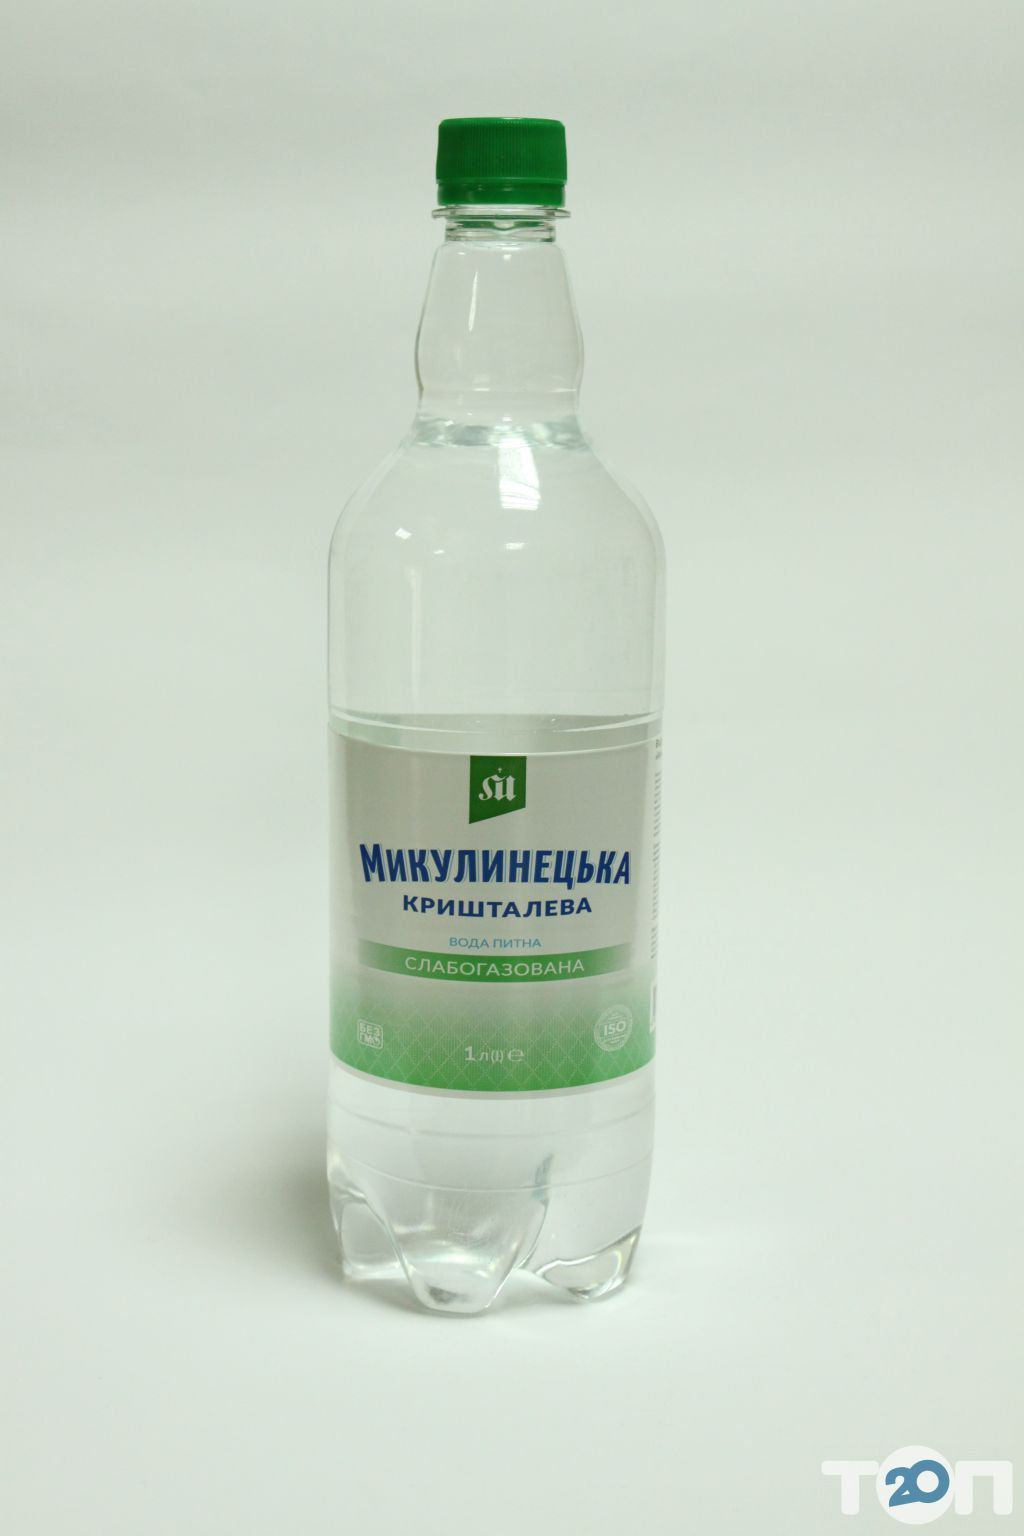 Микулинецький Бровар, виробник безалкогольних напоїв - фото 9